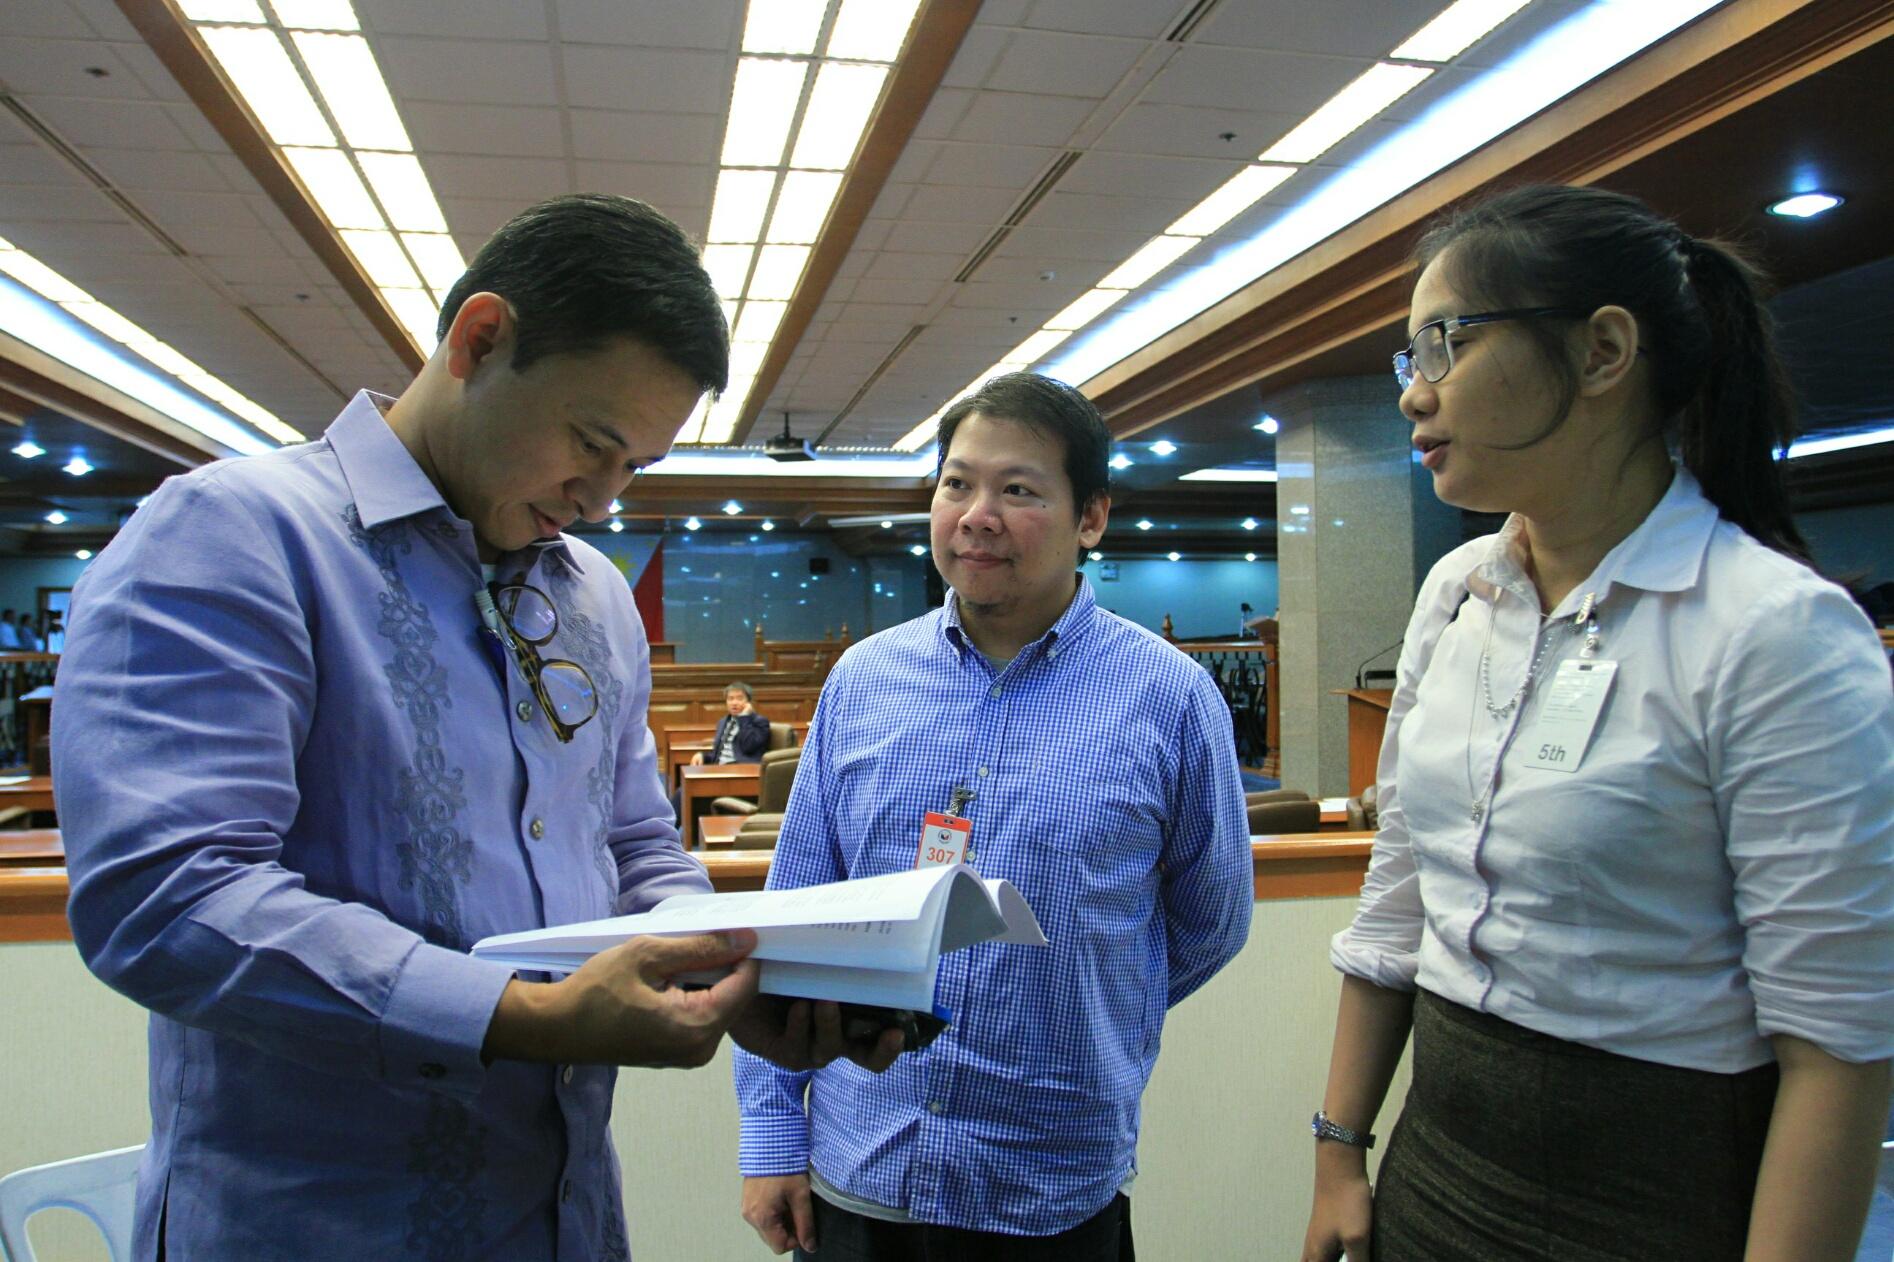 Senator Angara reads proposal from NOI.PH Team